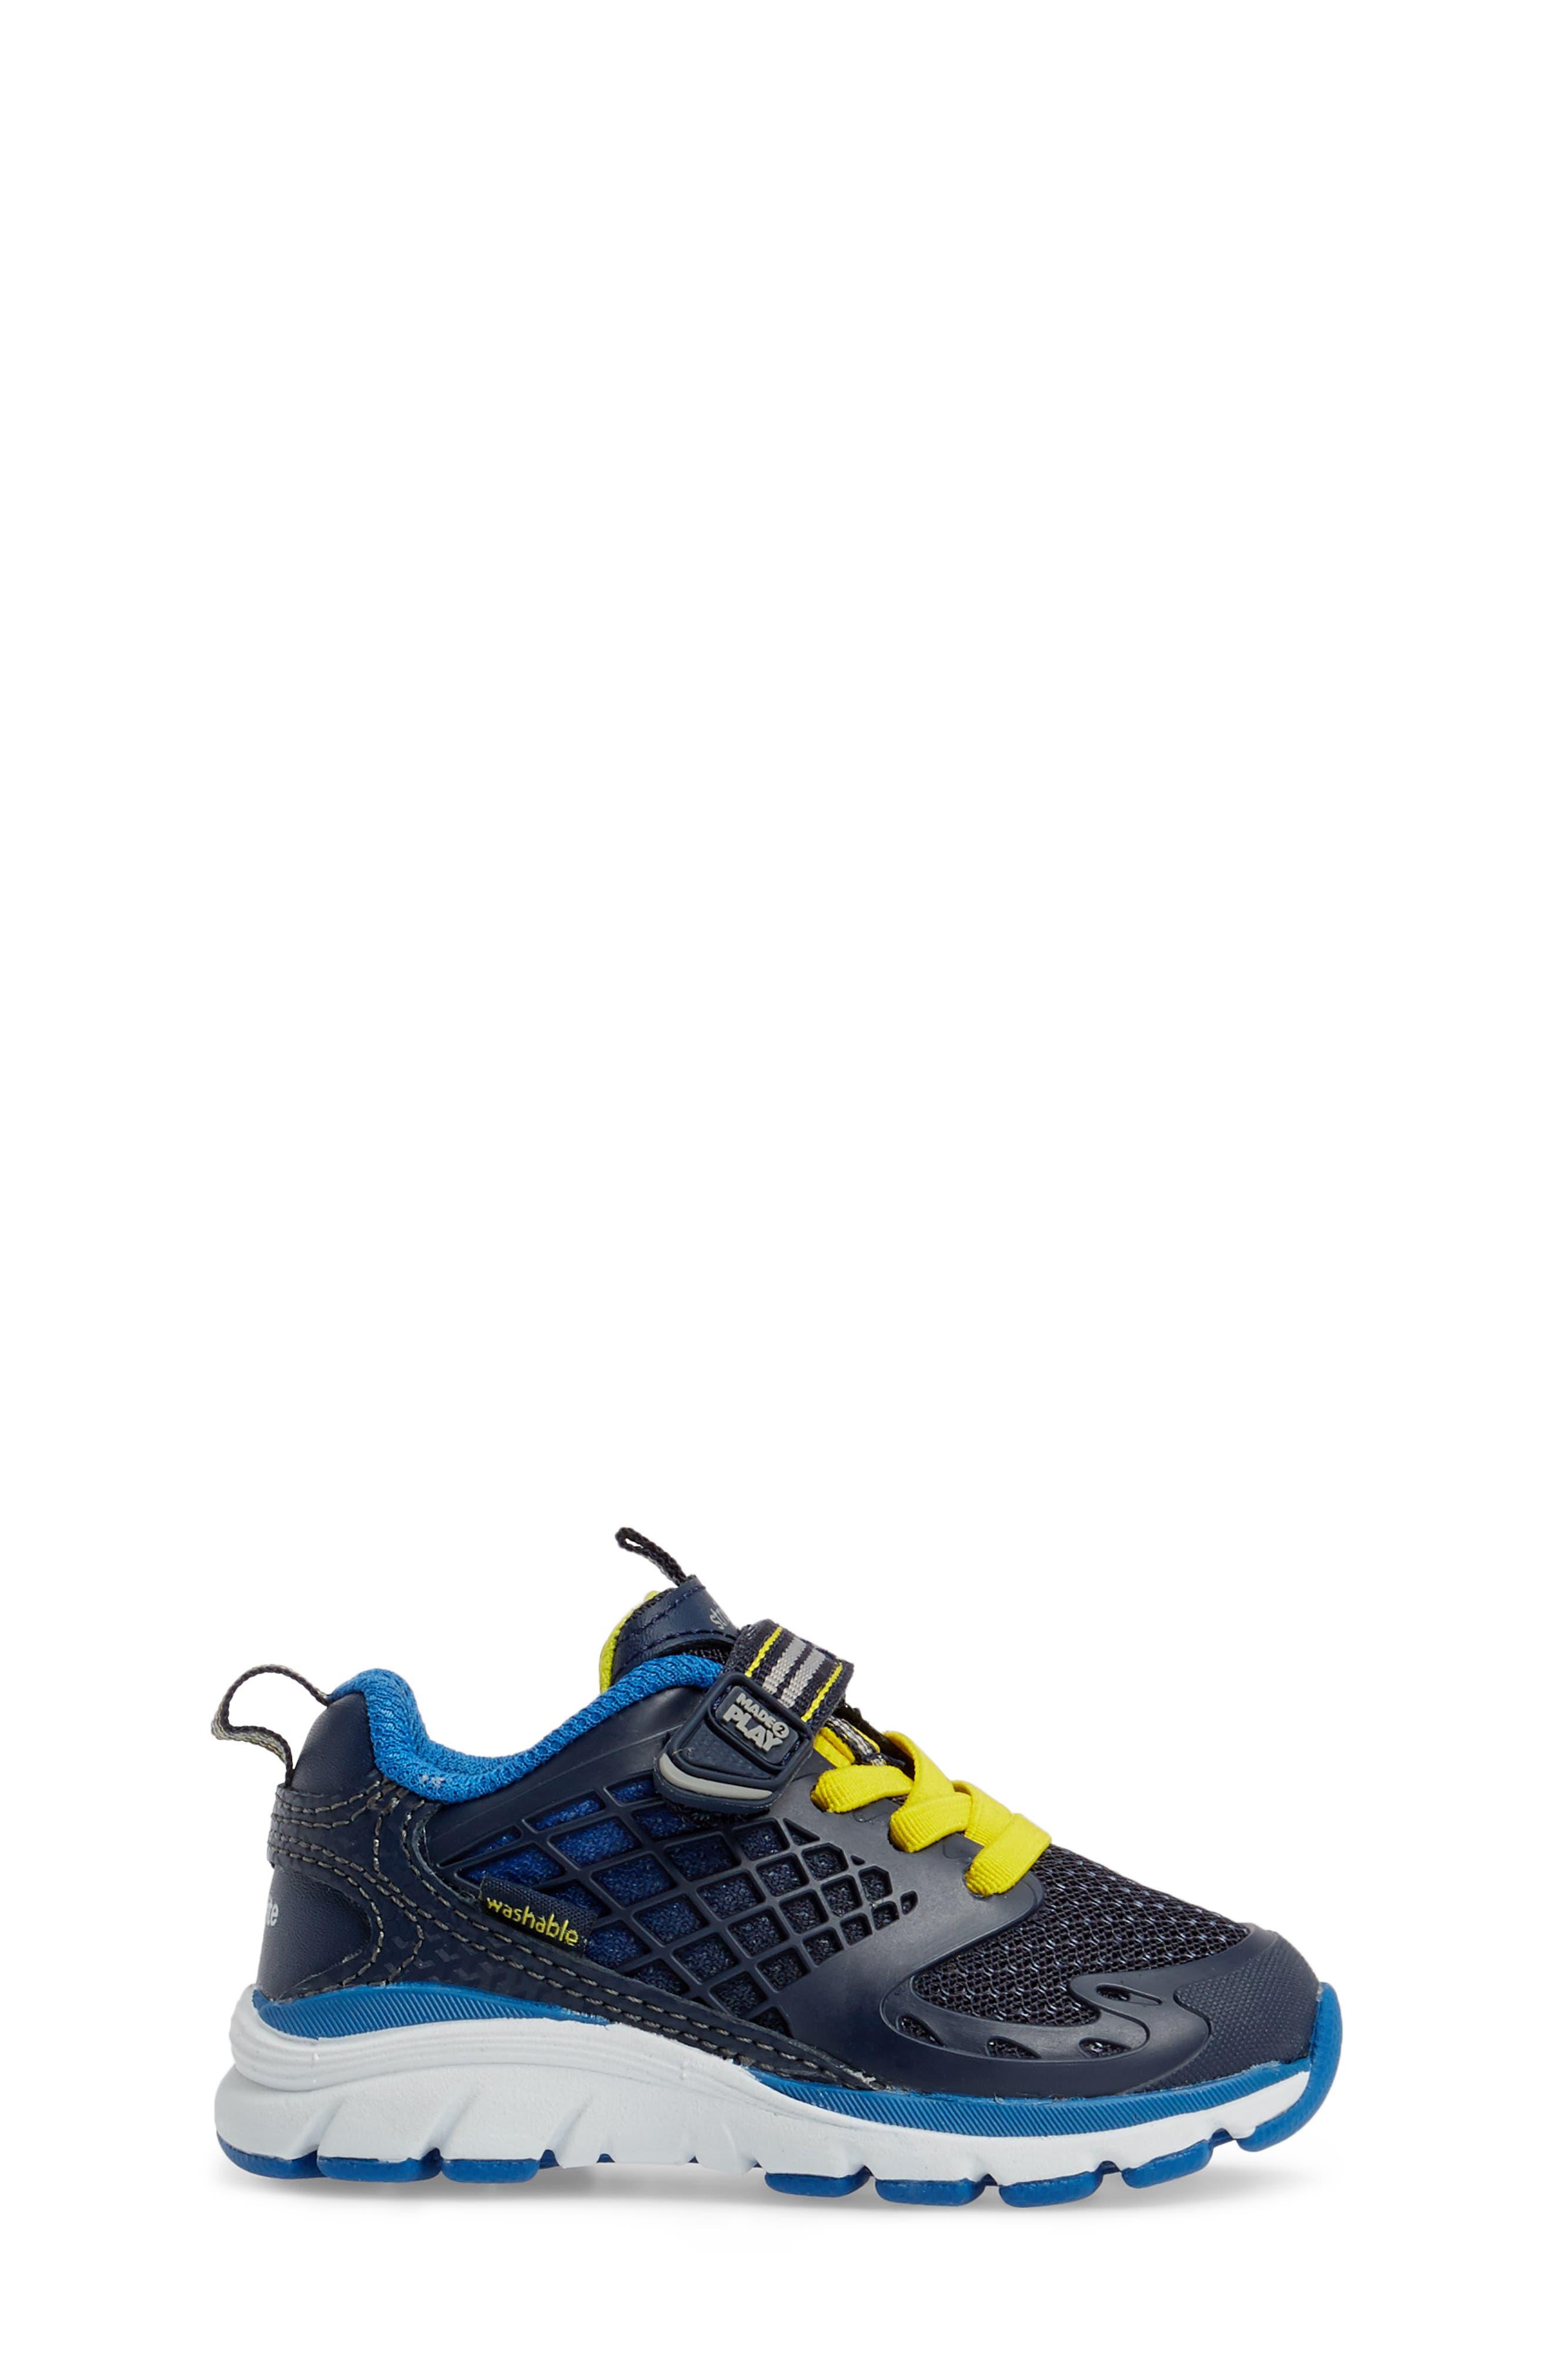 Made 2 Play Breccen Sneaker,                             Alternate thumbnail 3, color,                             Navy